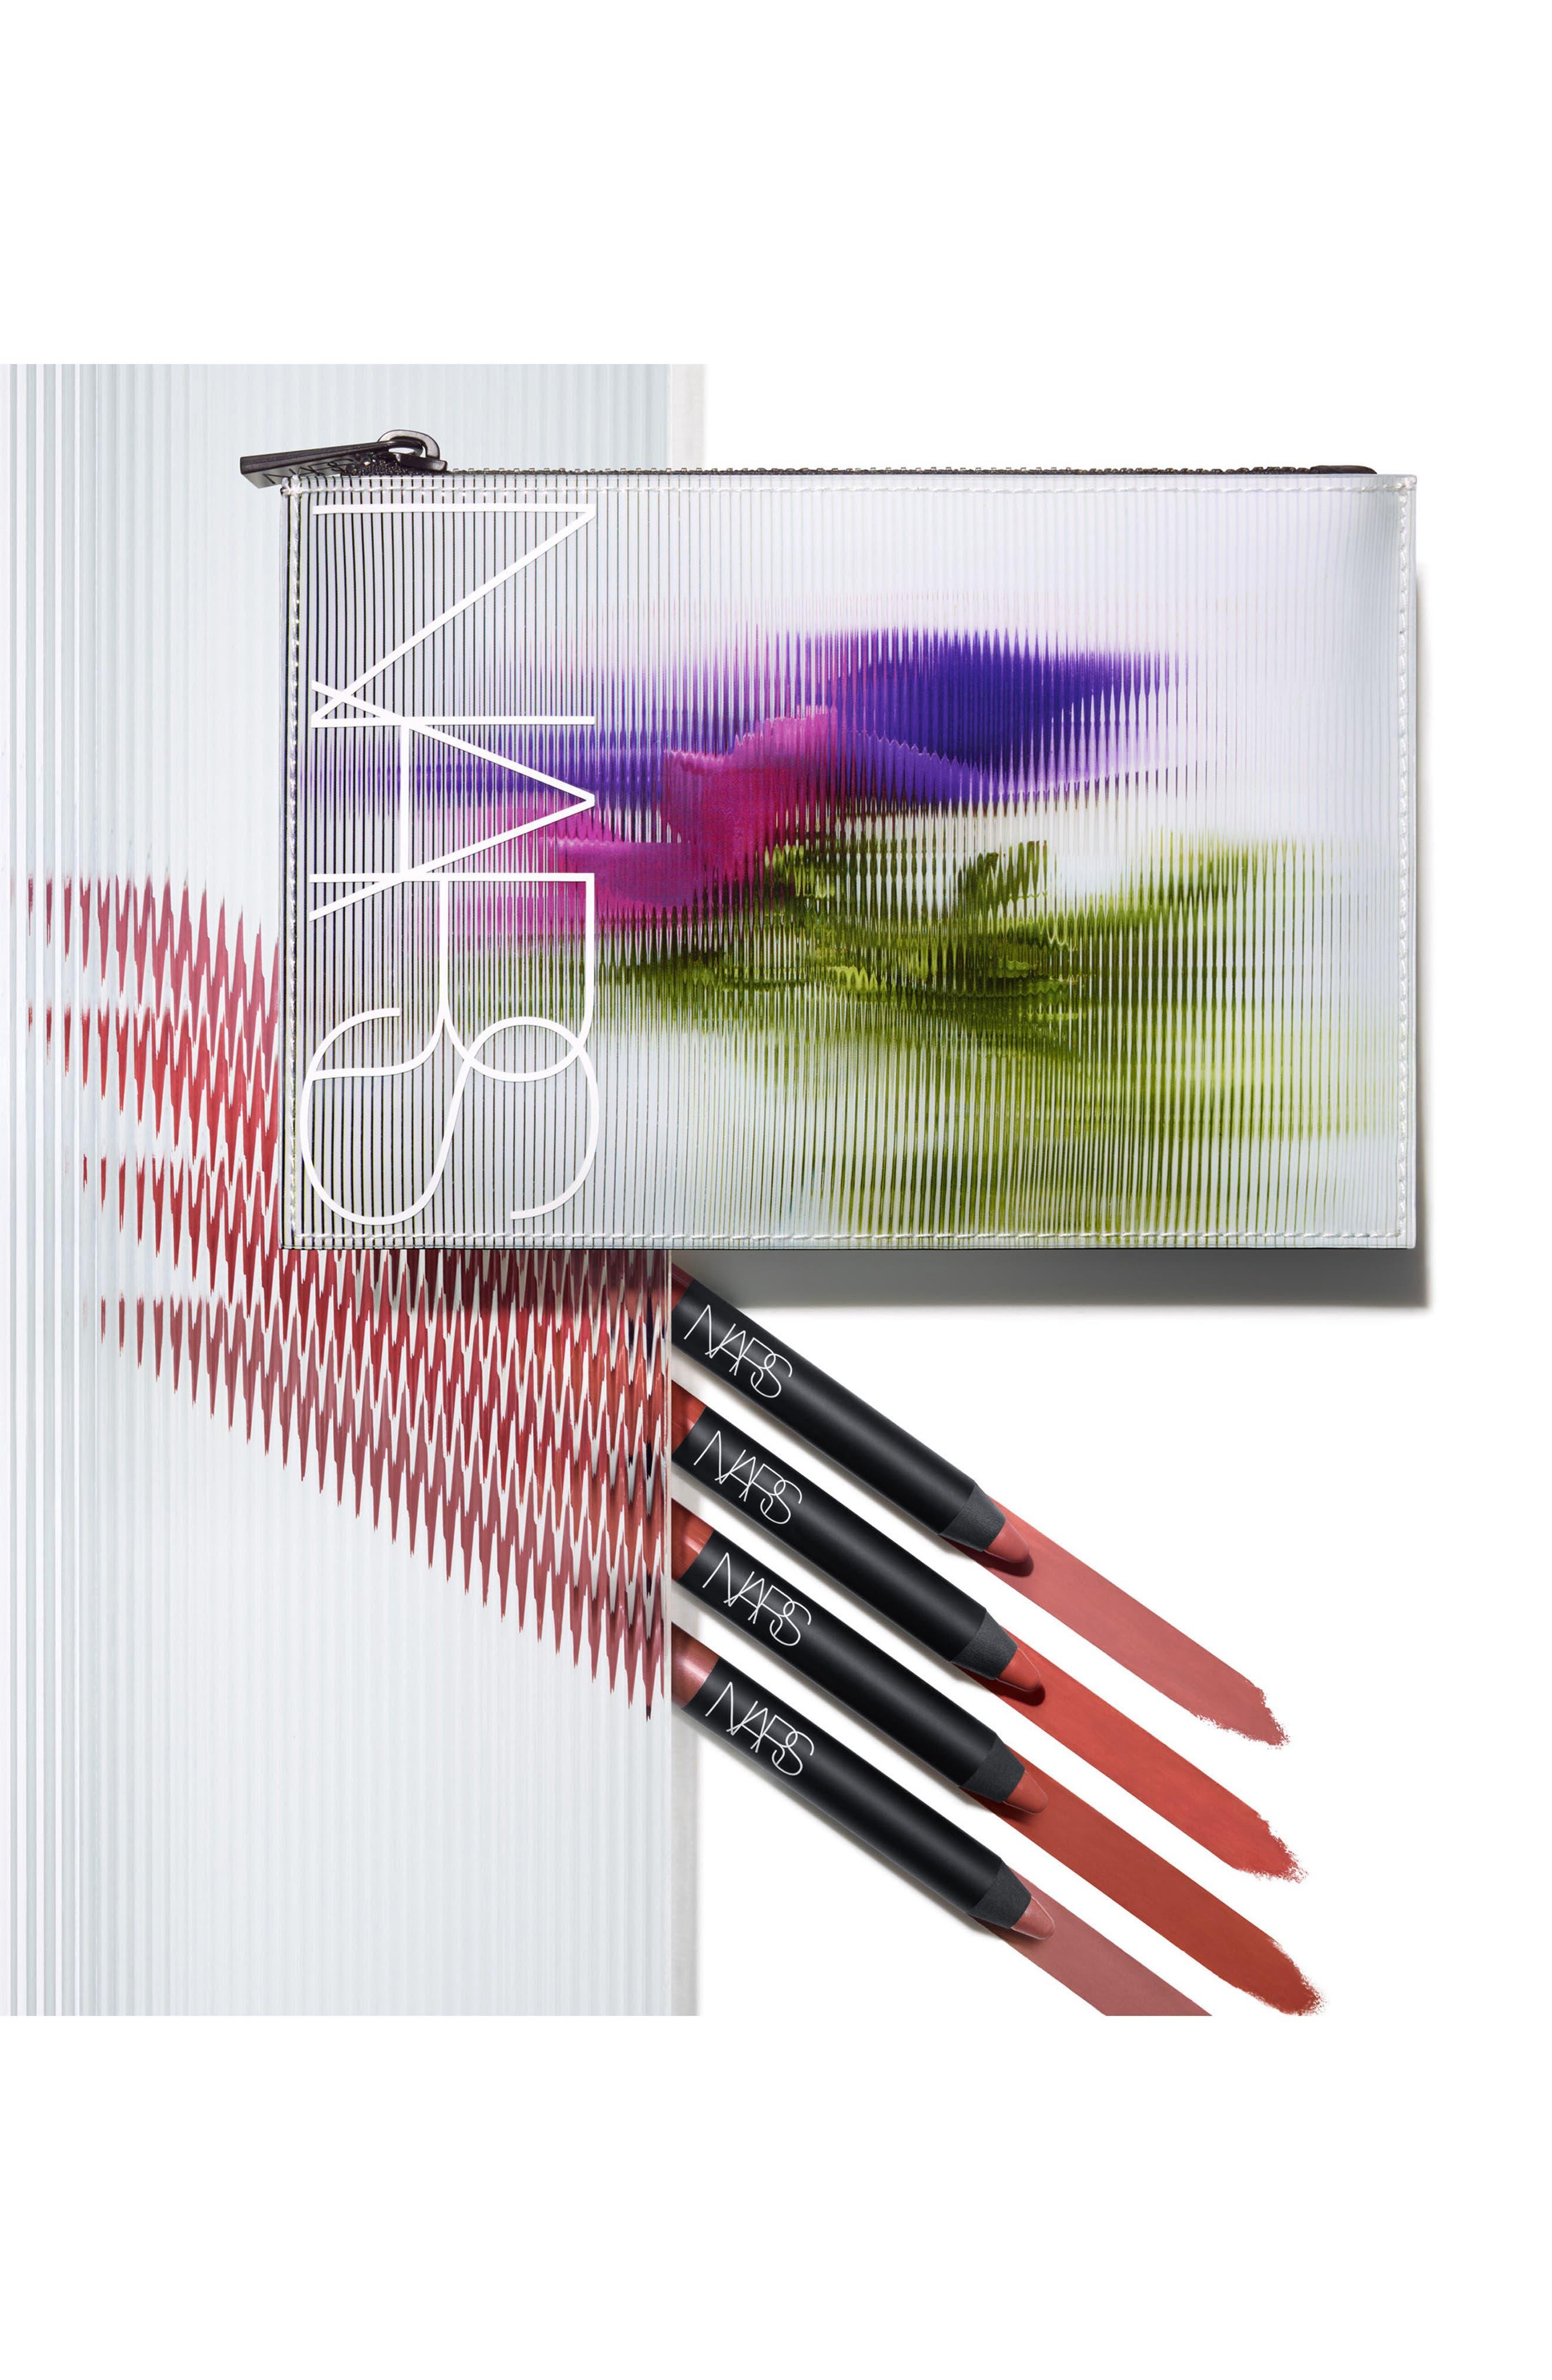 Velvet Matte Lipstick Pencil Set,                             Alternate thumbnail 7, color,                             250